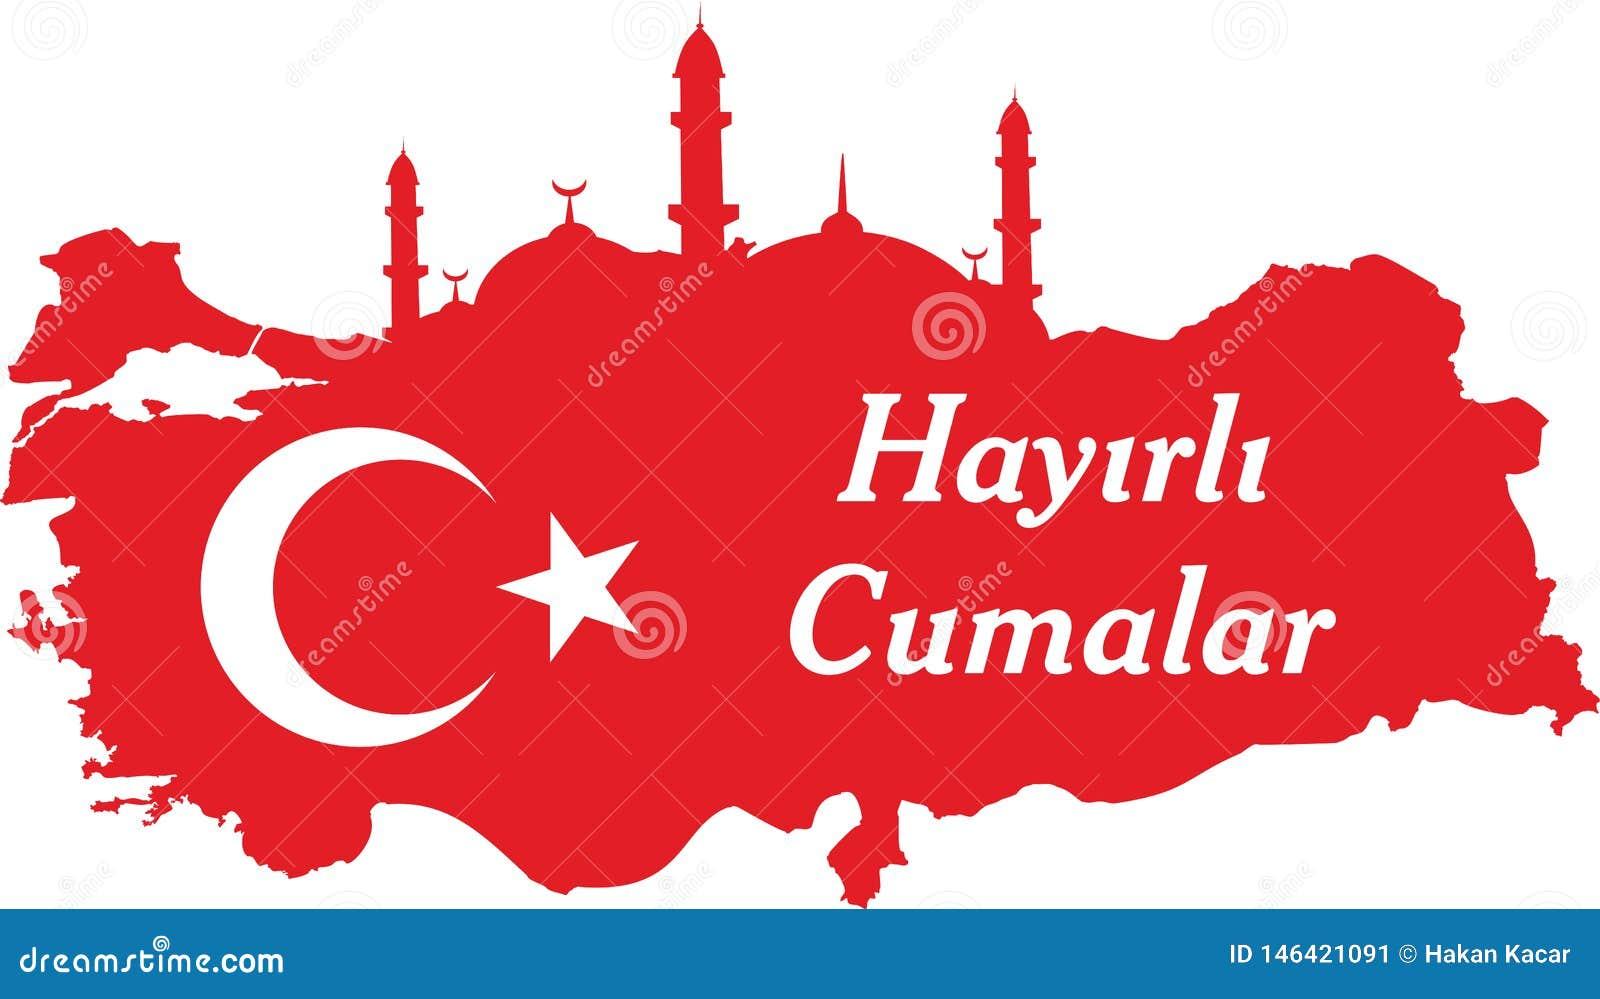 Ha en bra fredag turk talar: Hayirli Cumalar Illustration f?r Turkiet ?versiktsvektor Vektor av jumahmubarakah fredag mubarak i t